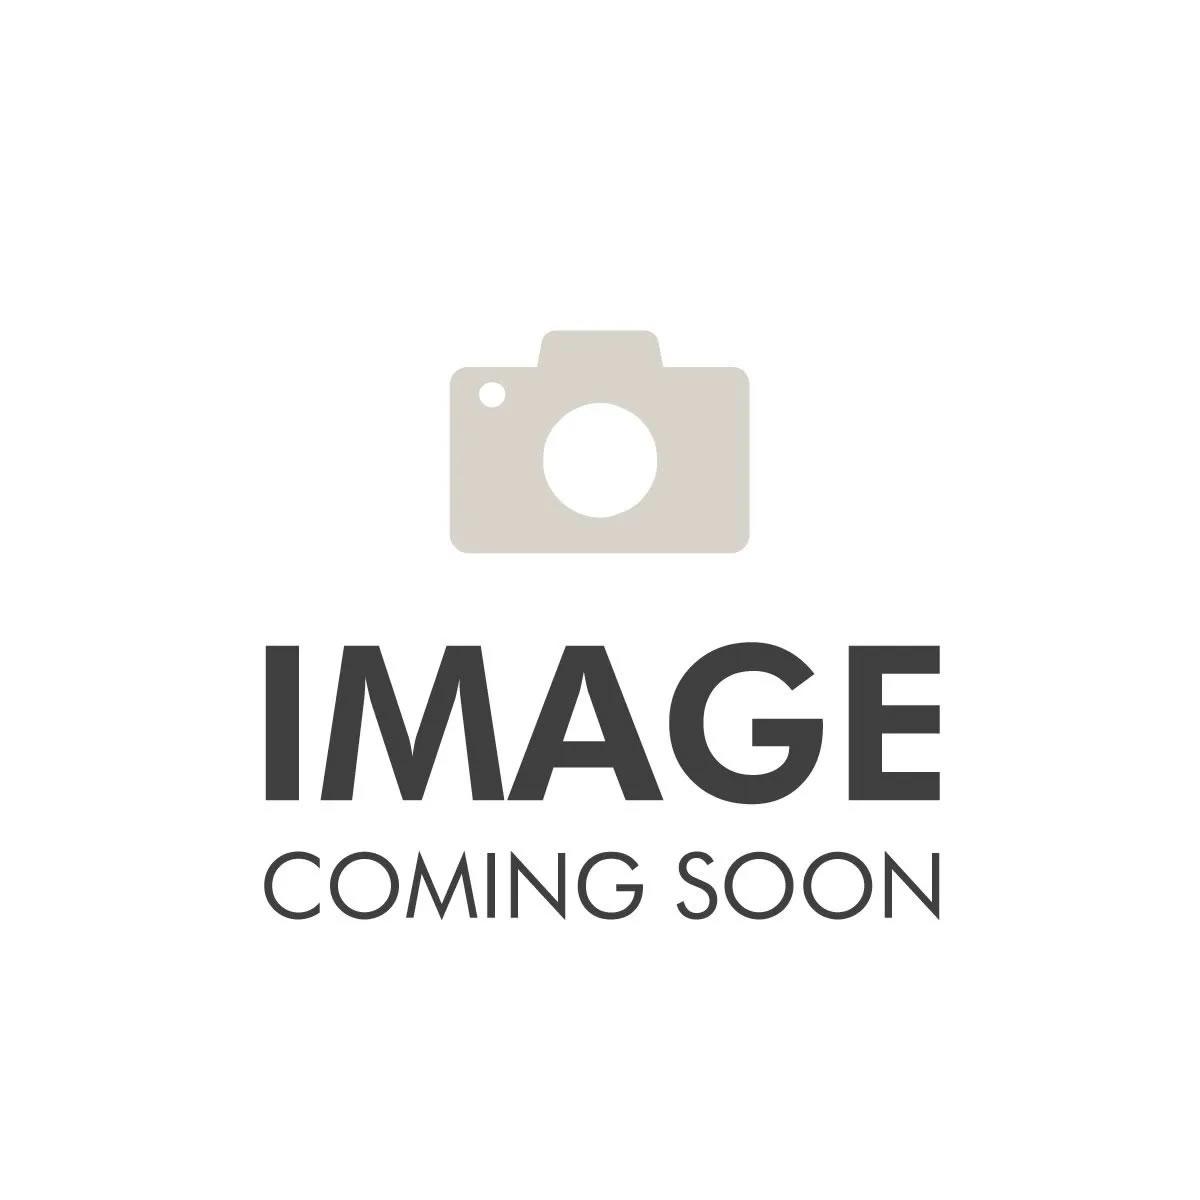 Neo Seat Protector Vests Gray 07-18 JK